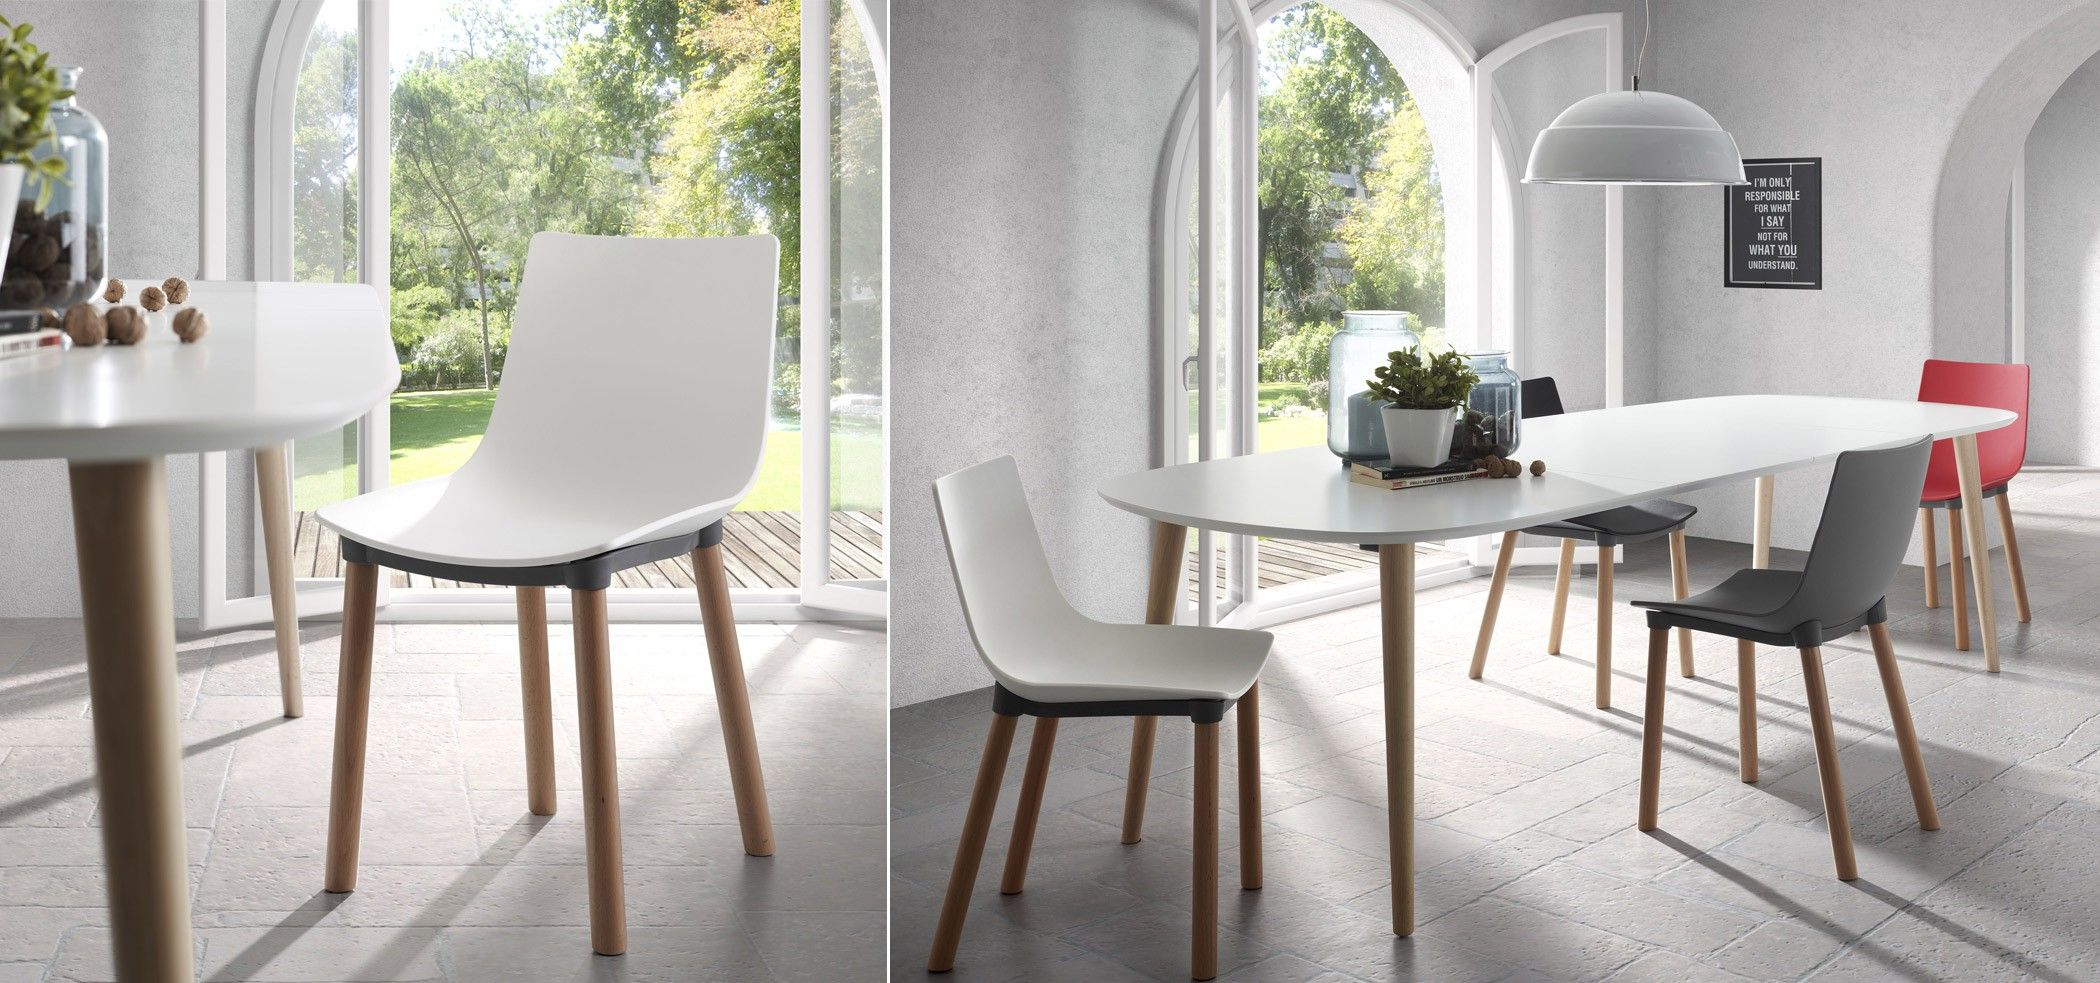 table oqui extensible ovale 140 220 x90 cm naturel et. Black Bedroom Furniture Sets. Home Design Ideas